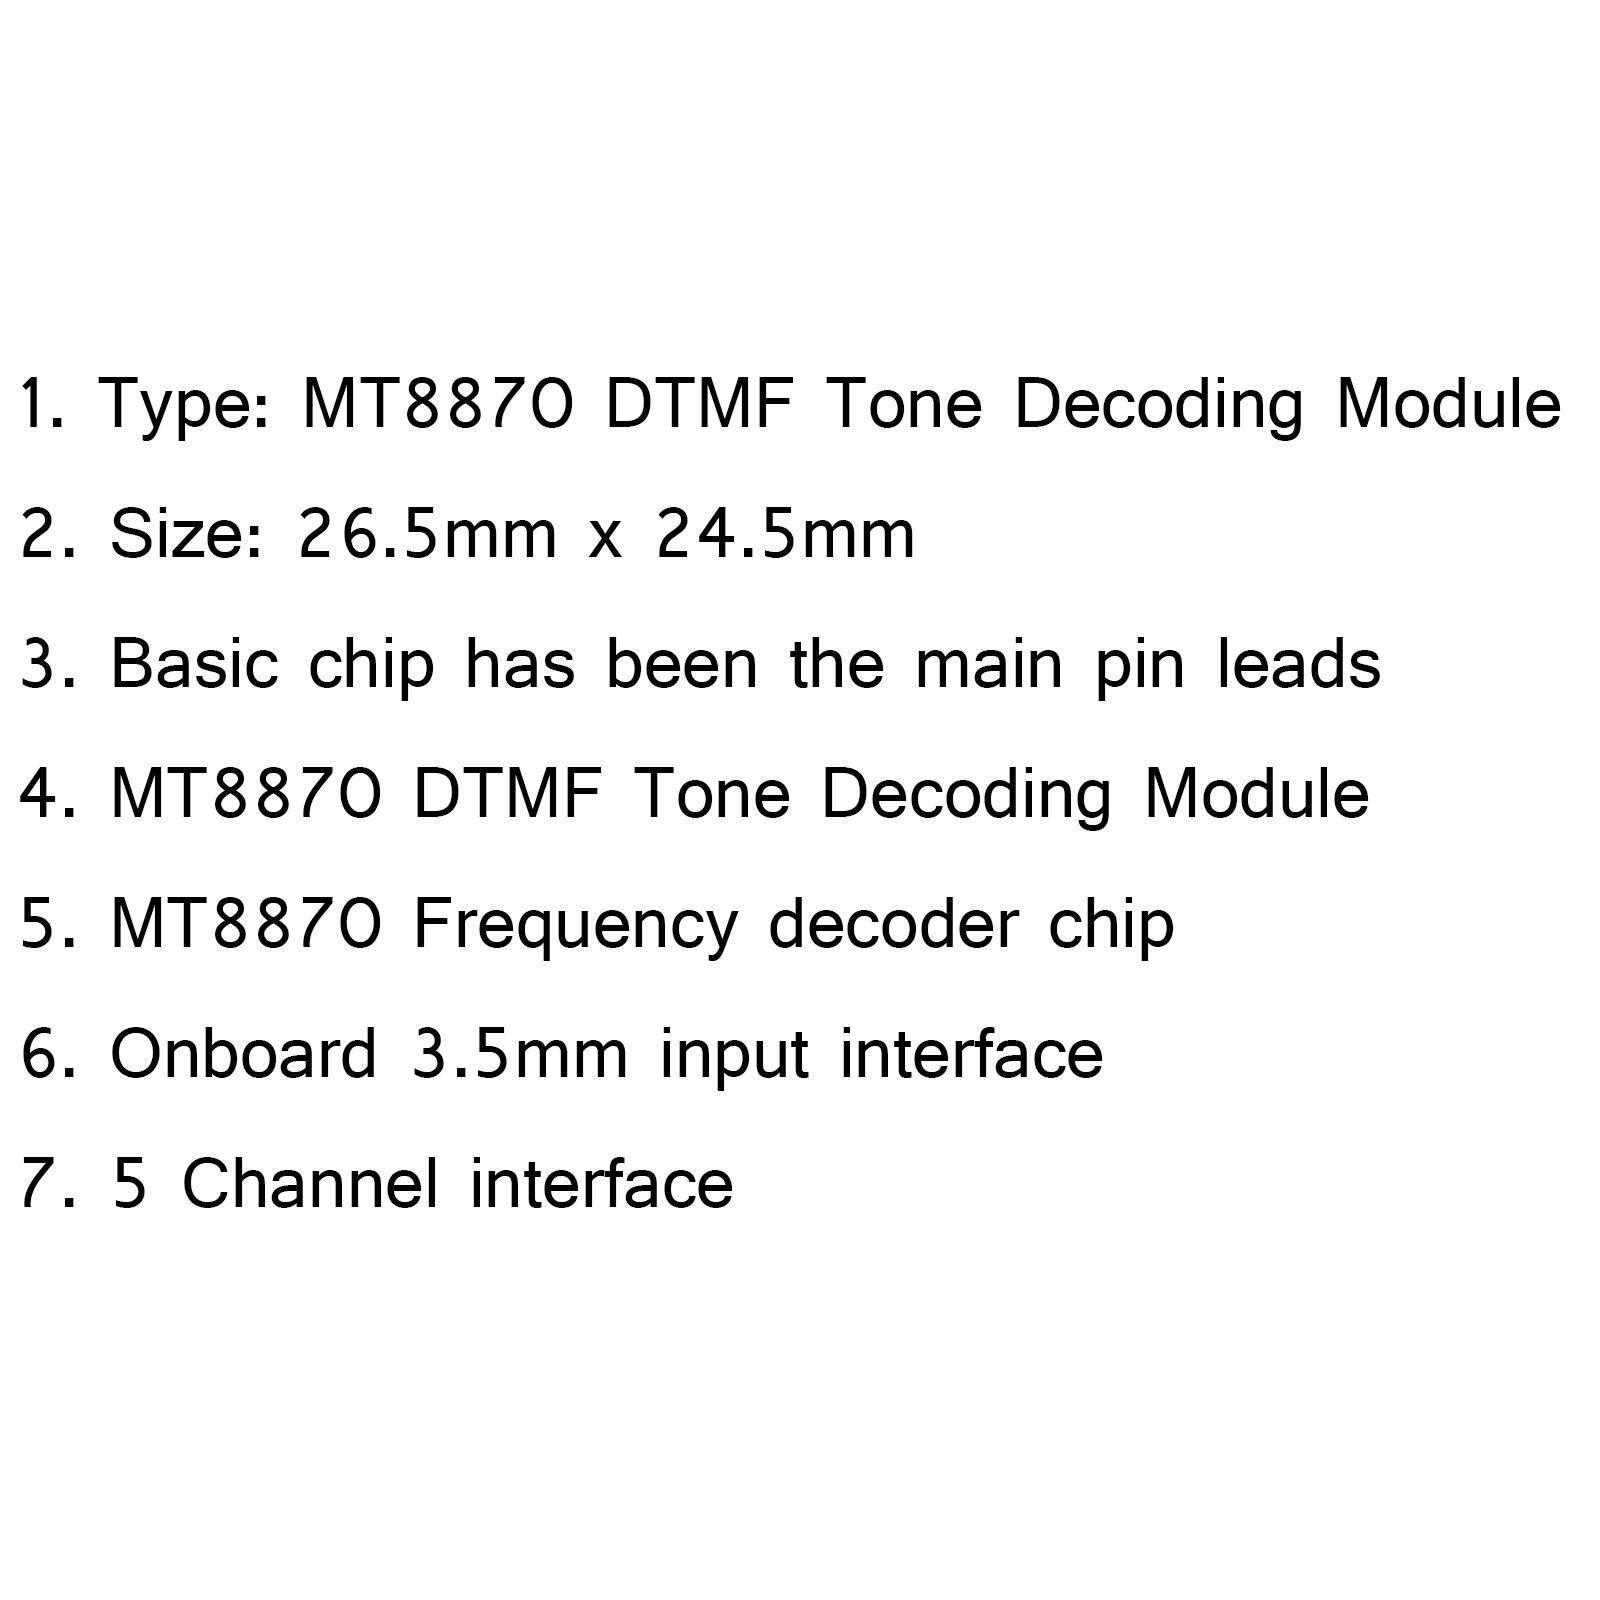 Areyourshop 1pcs Xd 61 Mt8870 Dtmf Tone Decoding Module Voice For Decoder Using Mt8870de Raspberry Pi Arduino Intl Gi Ch 106000